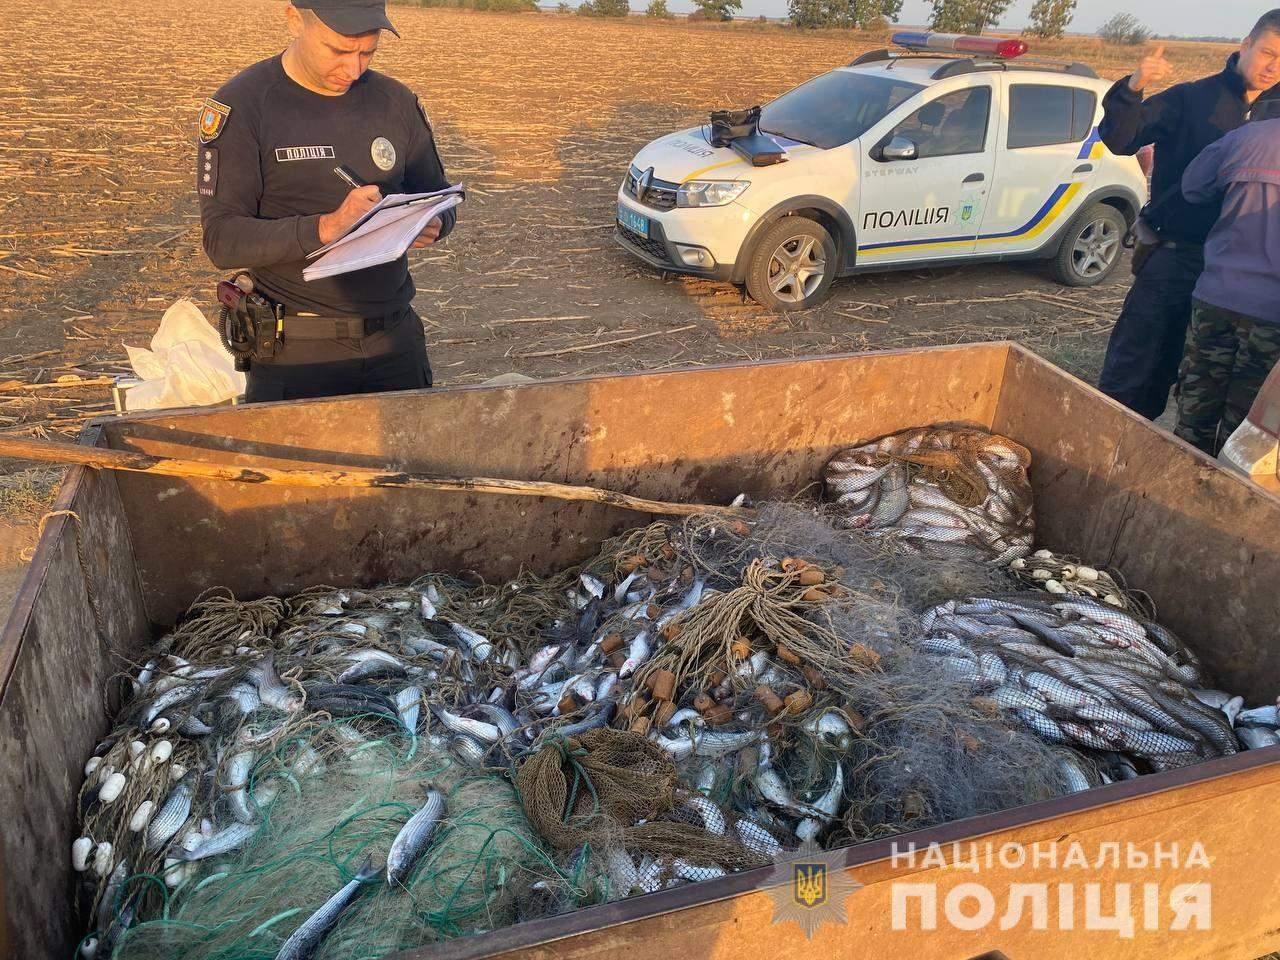 Рибне браконьєрство Одеса 12 жовтня 2021